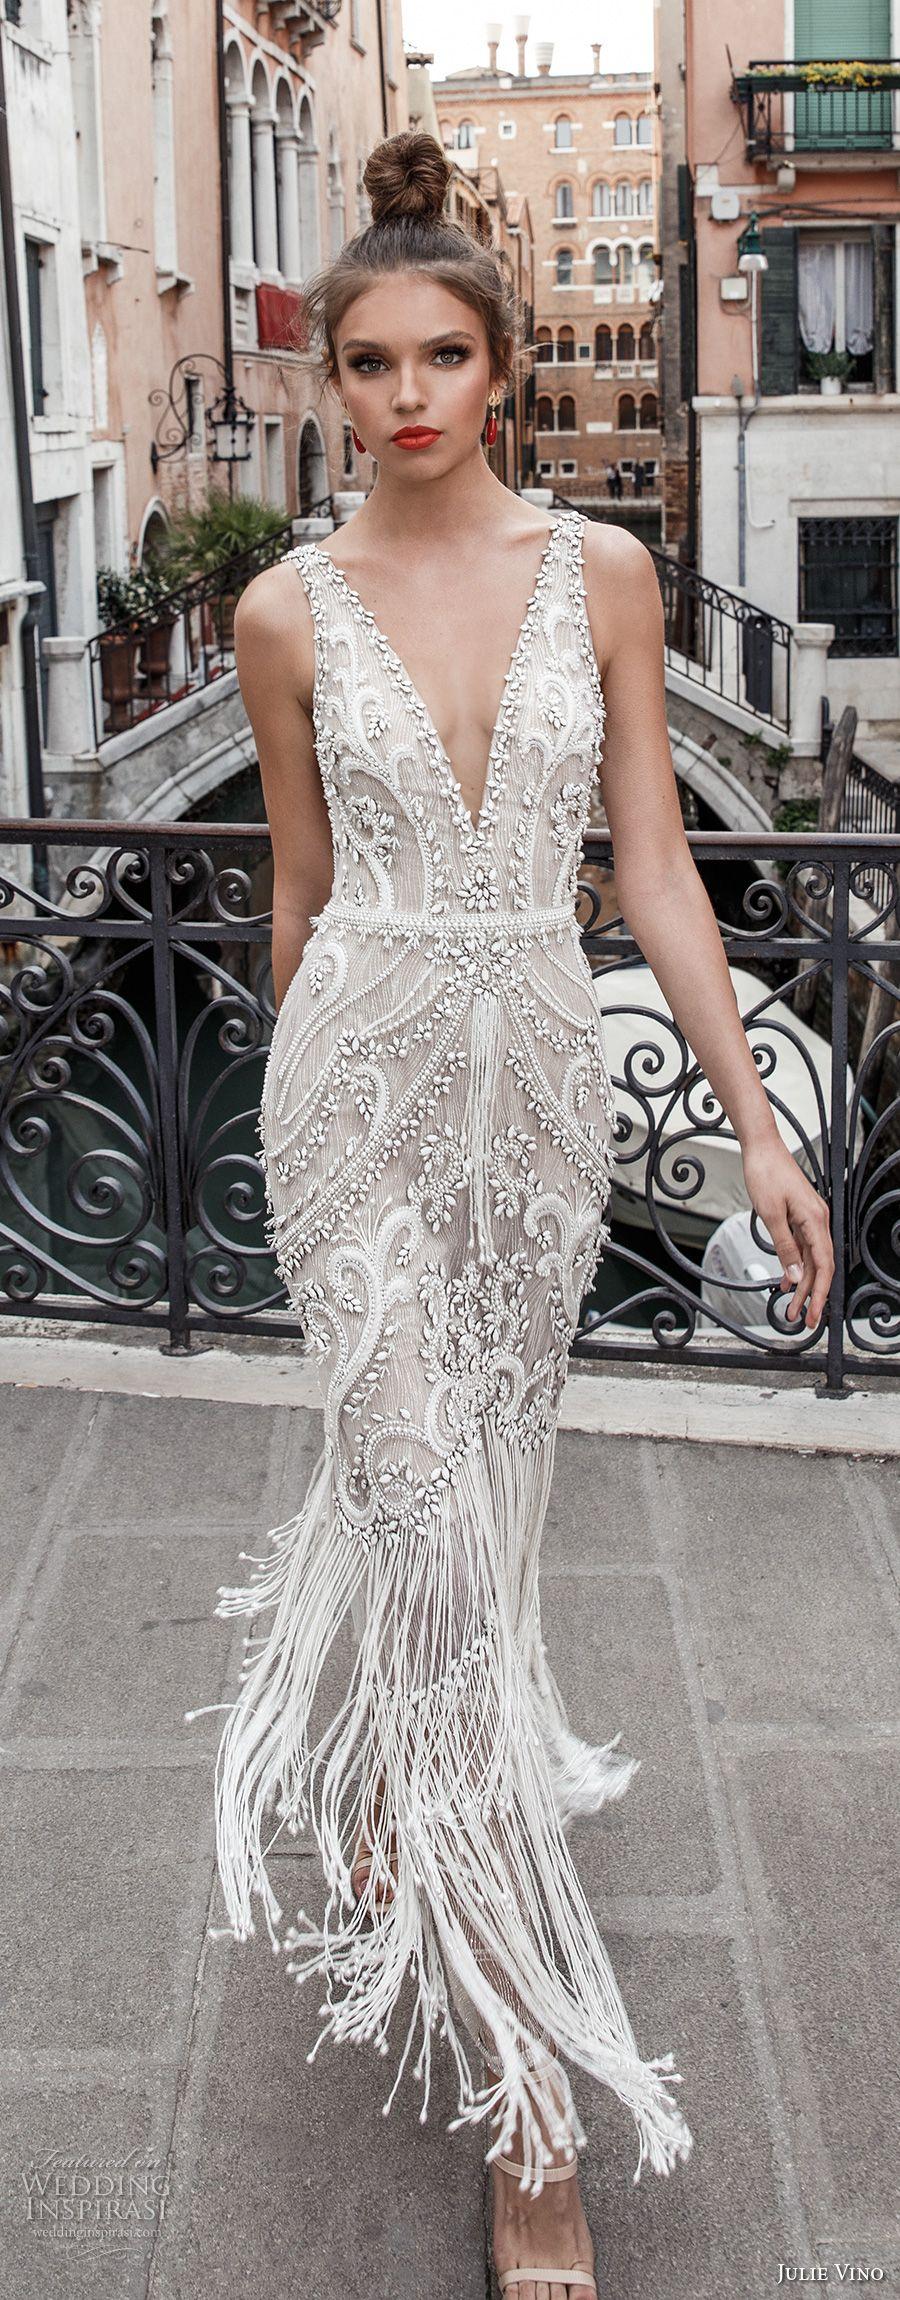 Julie Vino Spring 2018 Wedding Dresses Venezia Bridal Collection Wedding Inspirasi Wedding Dress Inspiration Bridal Dresses V Neck Wedding Dress [ 2300 x 900 Pixel ]